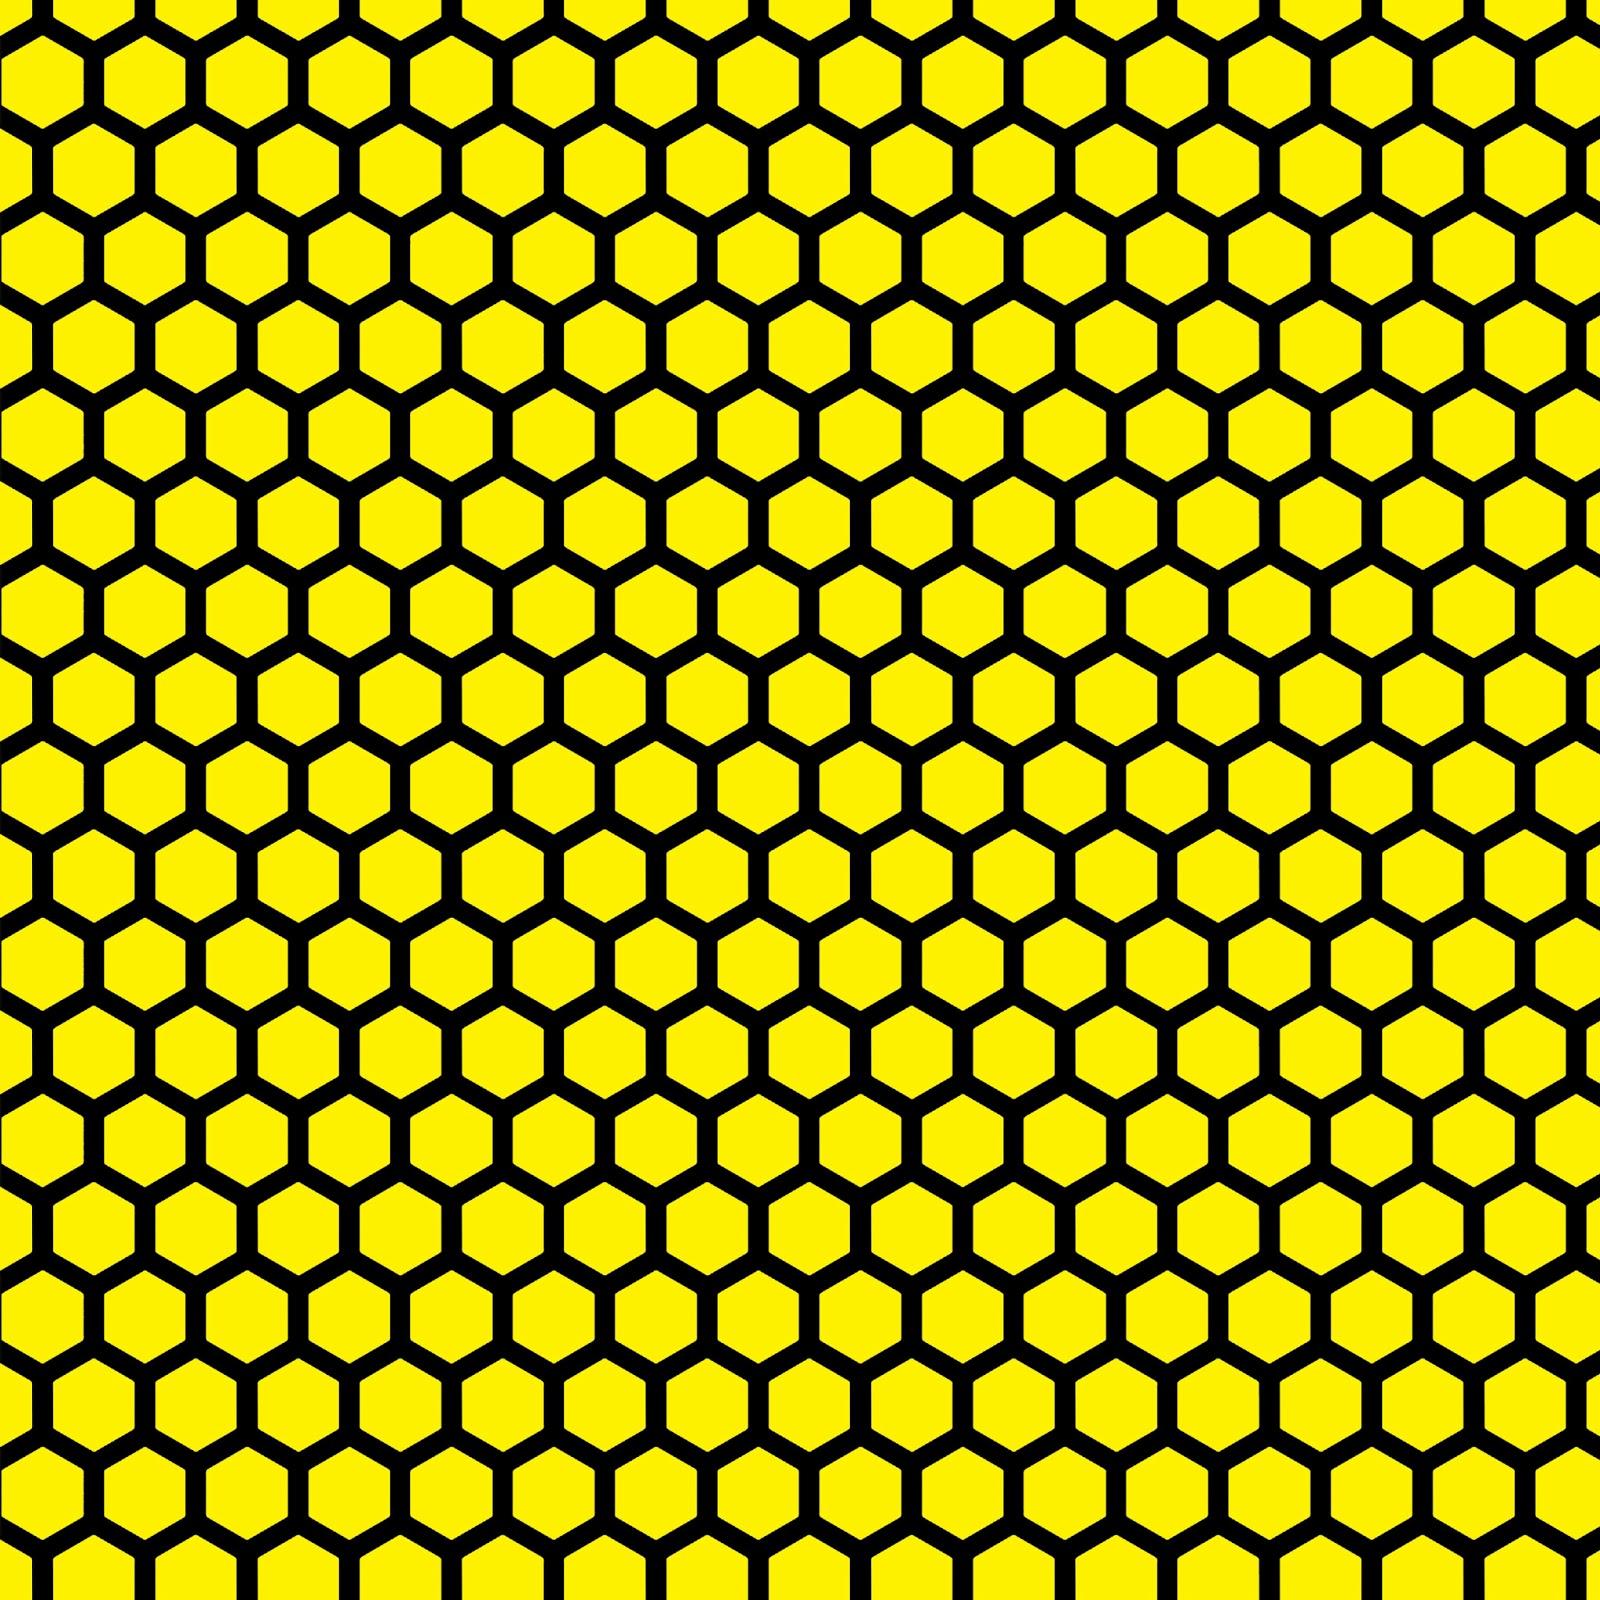 Neon Honeycomb Wallpaper by K3nny94 on DeviantArt |Yellow Honeycomb Wallpaper